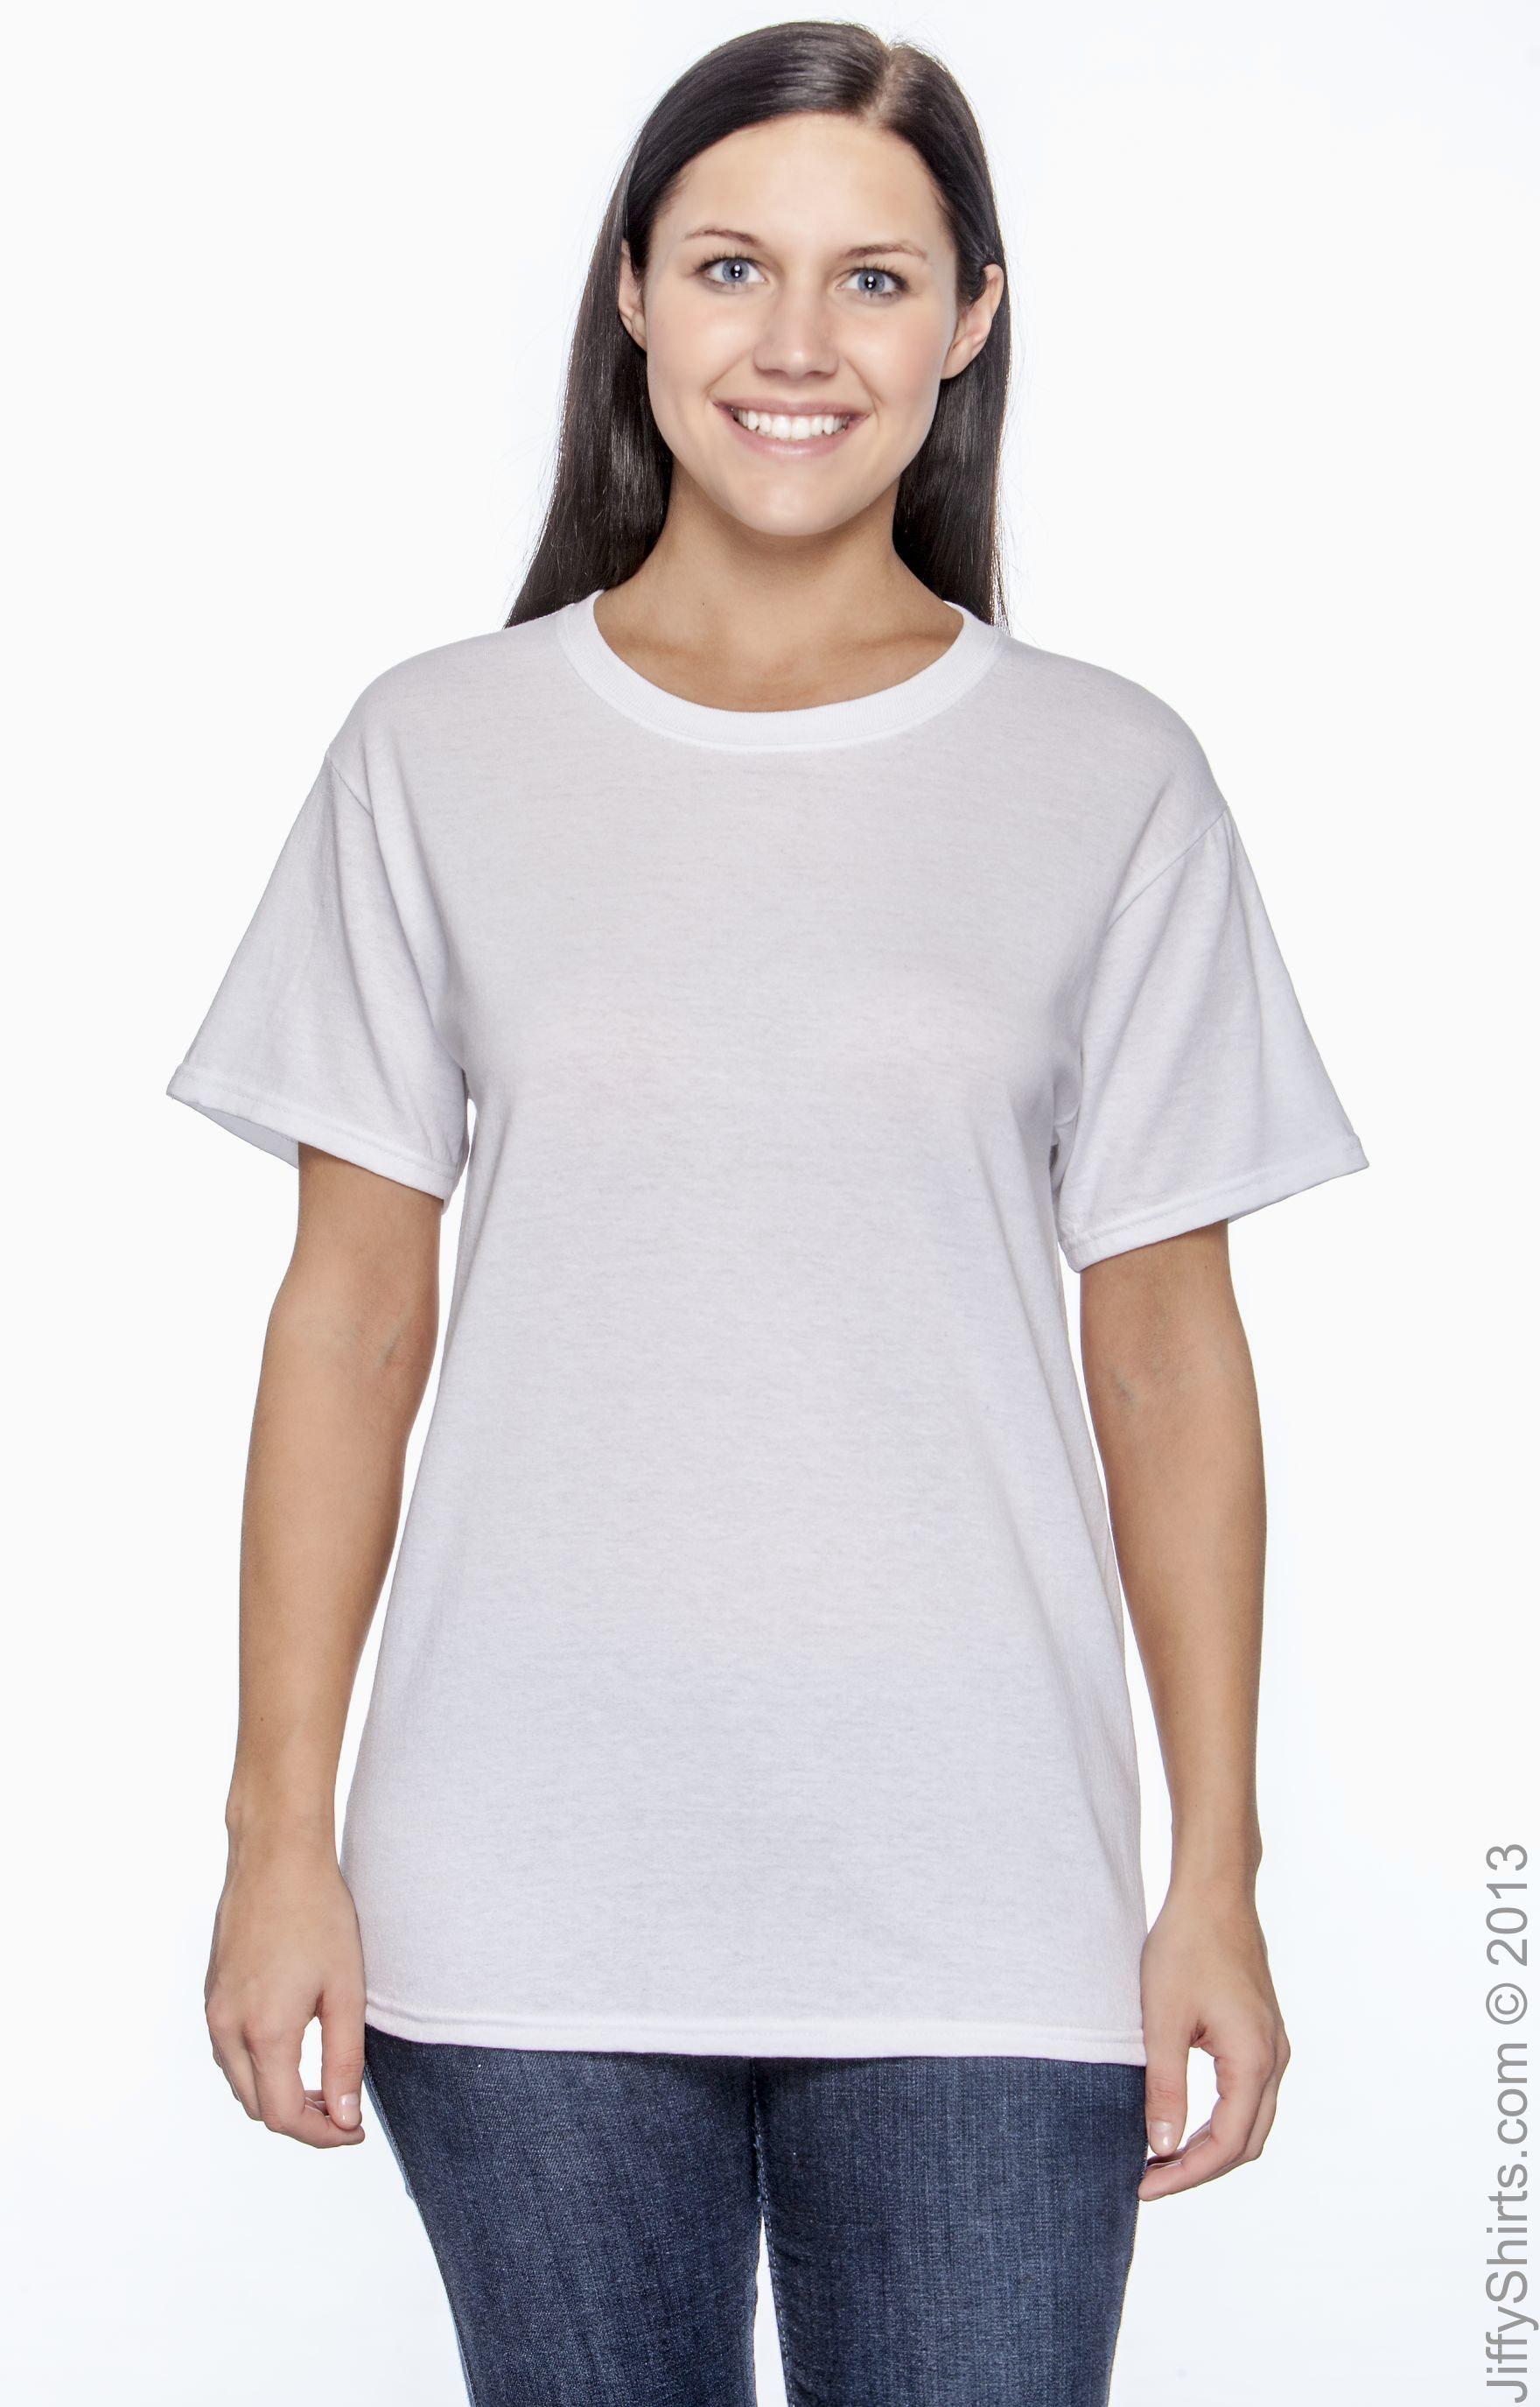 Hanes 5170 White